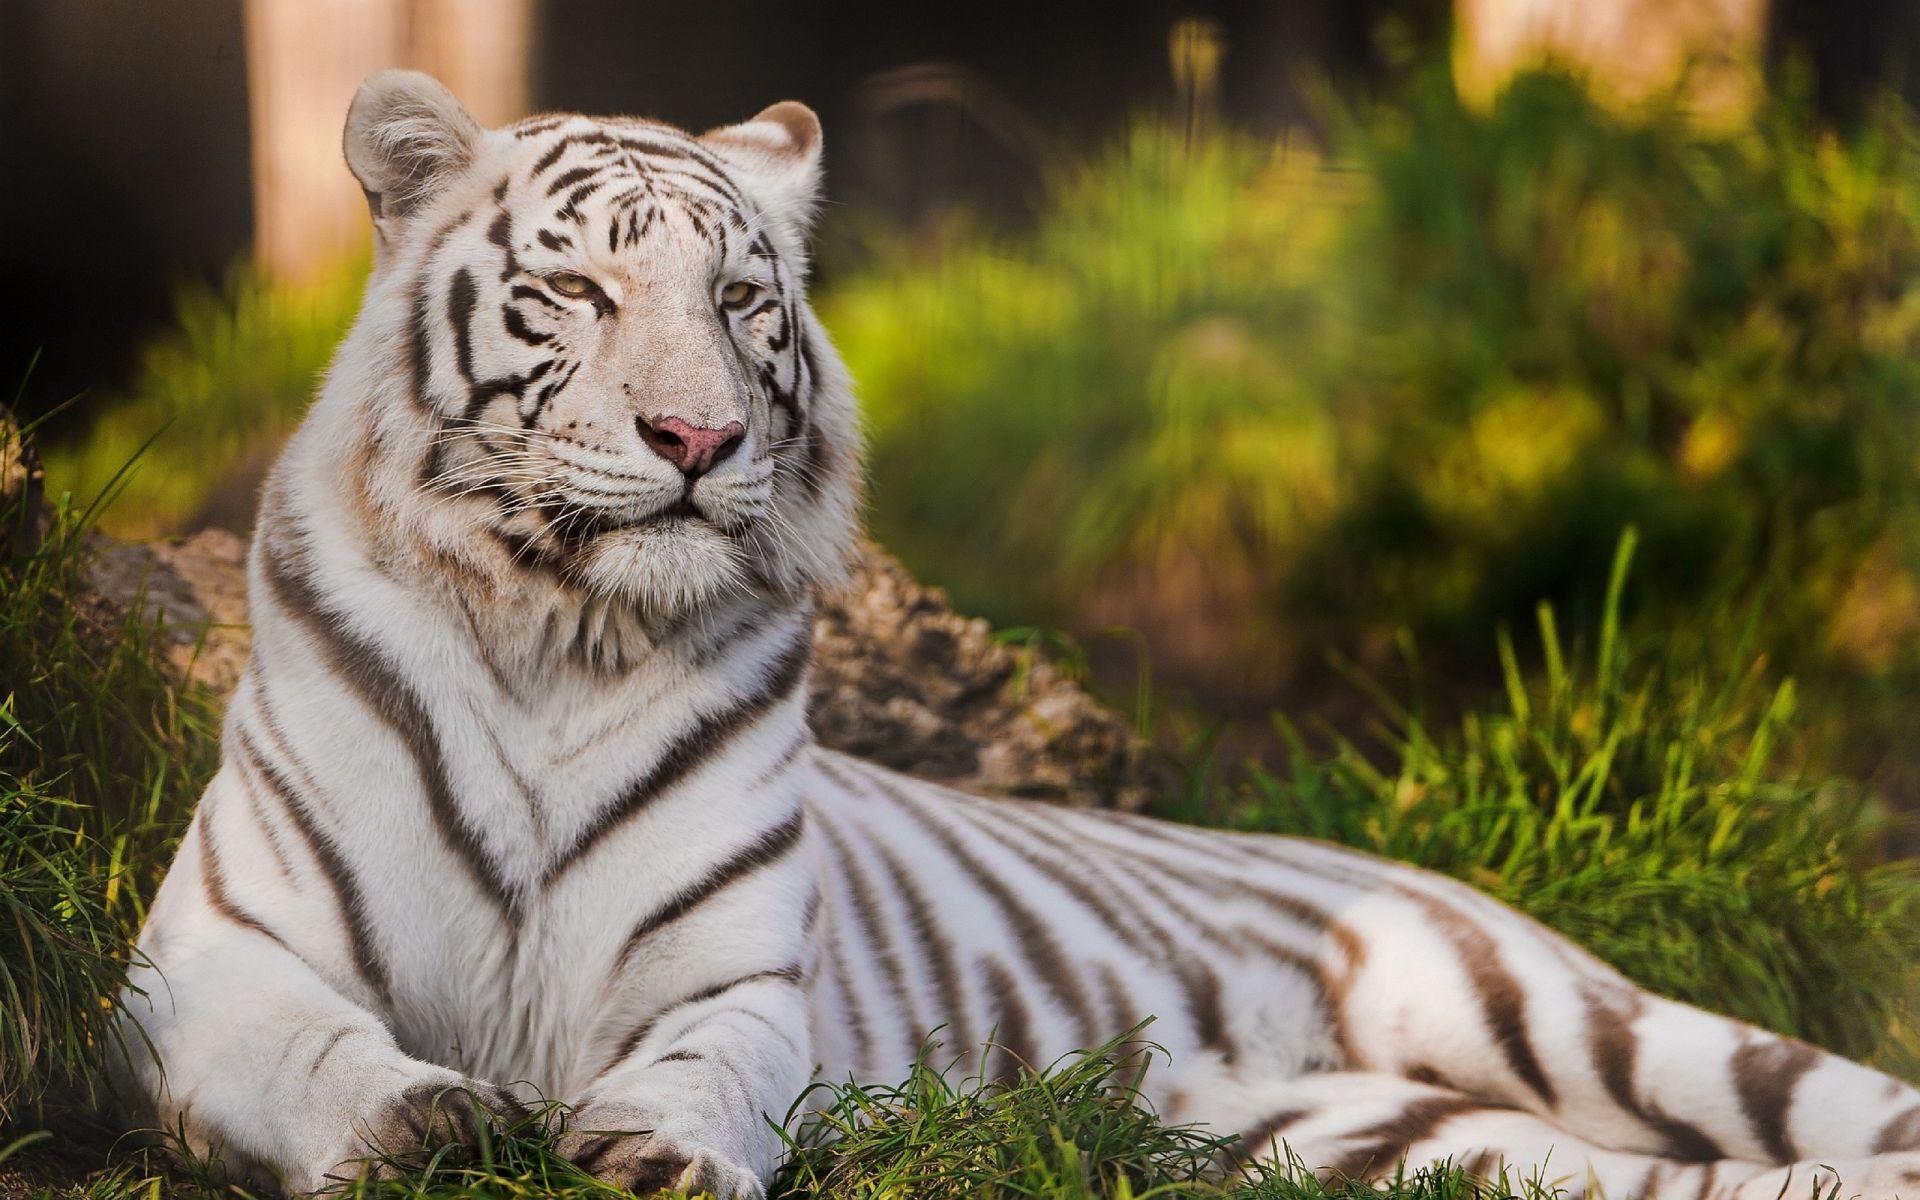 White Tiger, Free Wallpaper